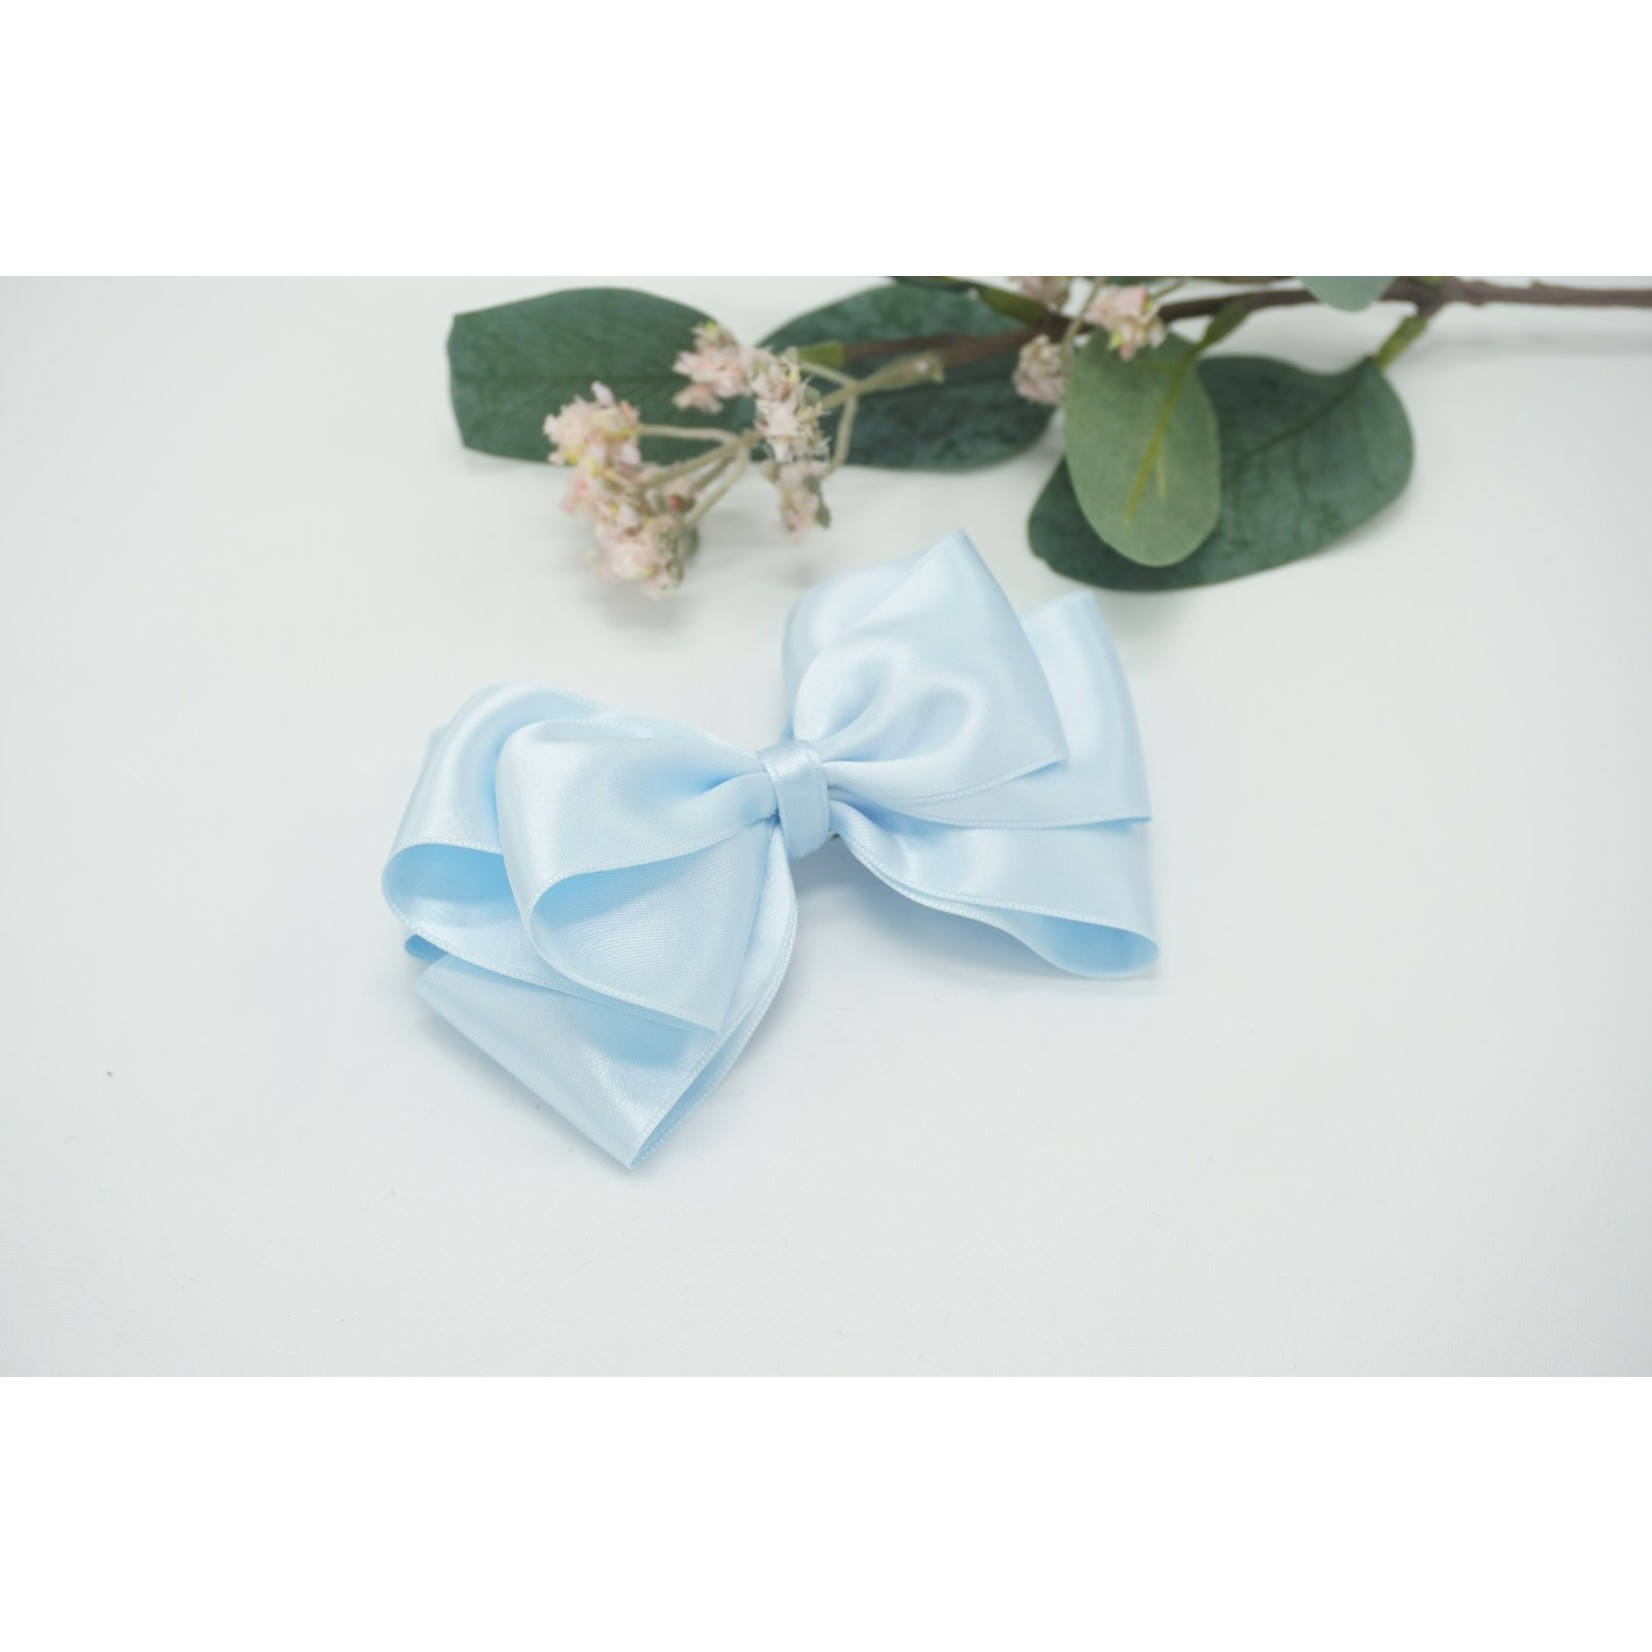 Petite Zara Copy of Butterfly Bow - Pastel Green 12cm